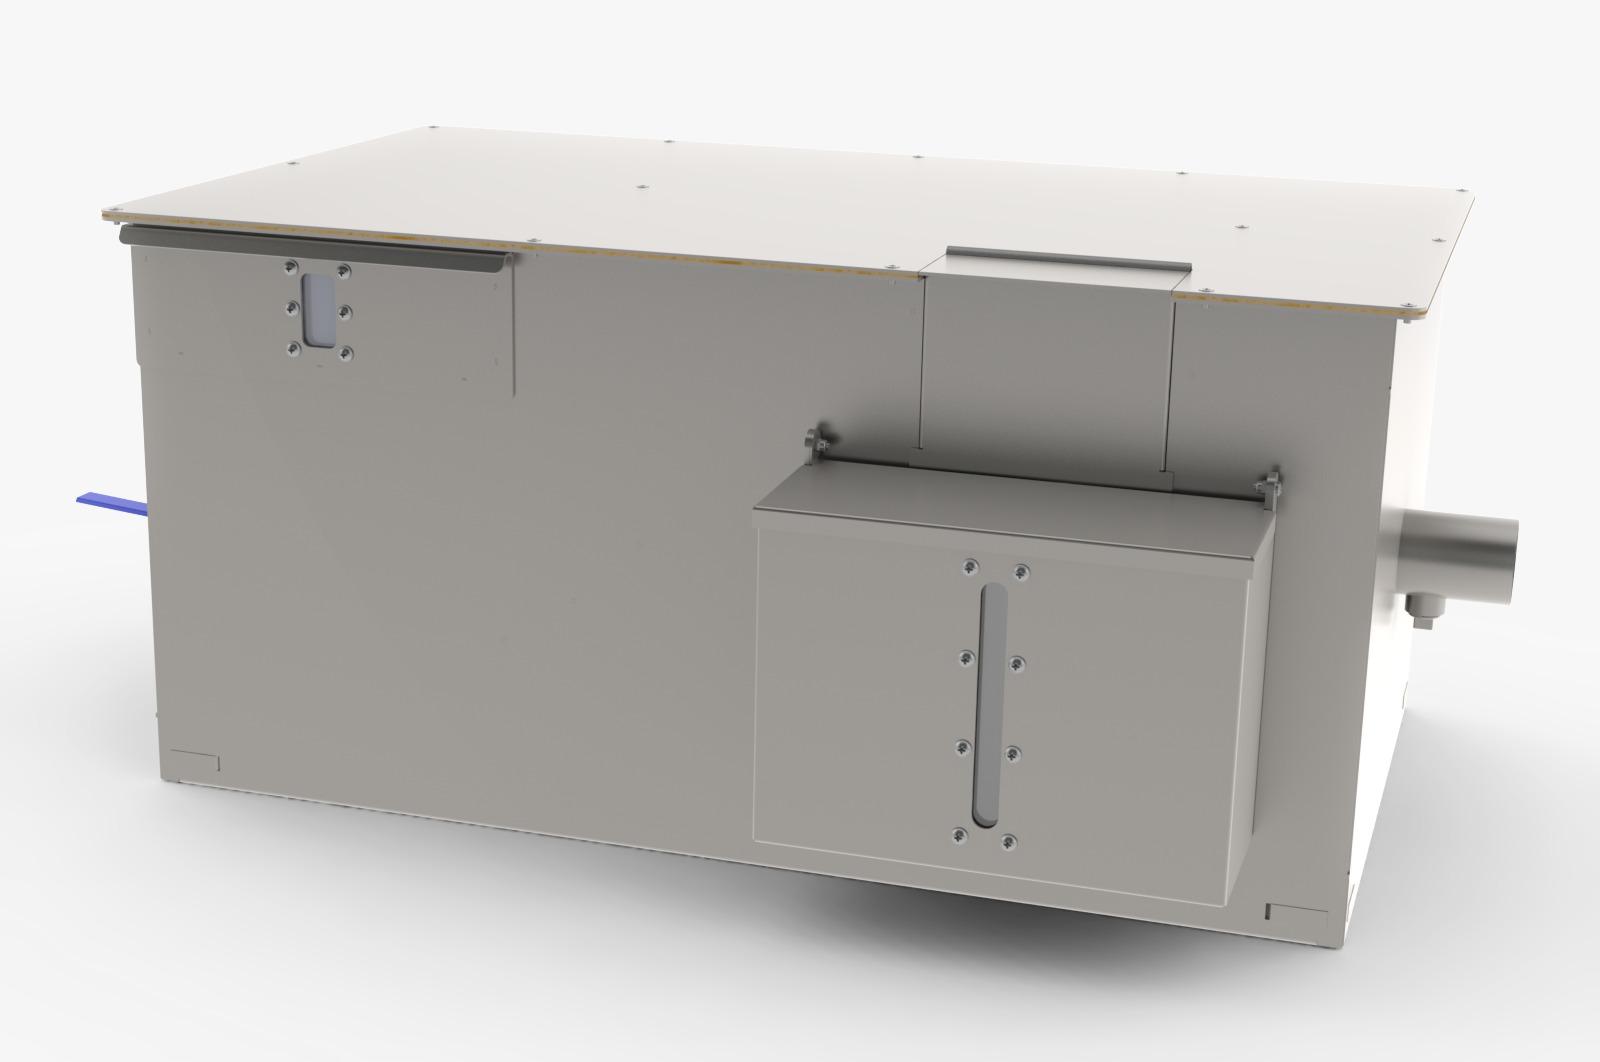 HC3 Grease removal unit - Fog Fellow Designs LTD